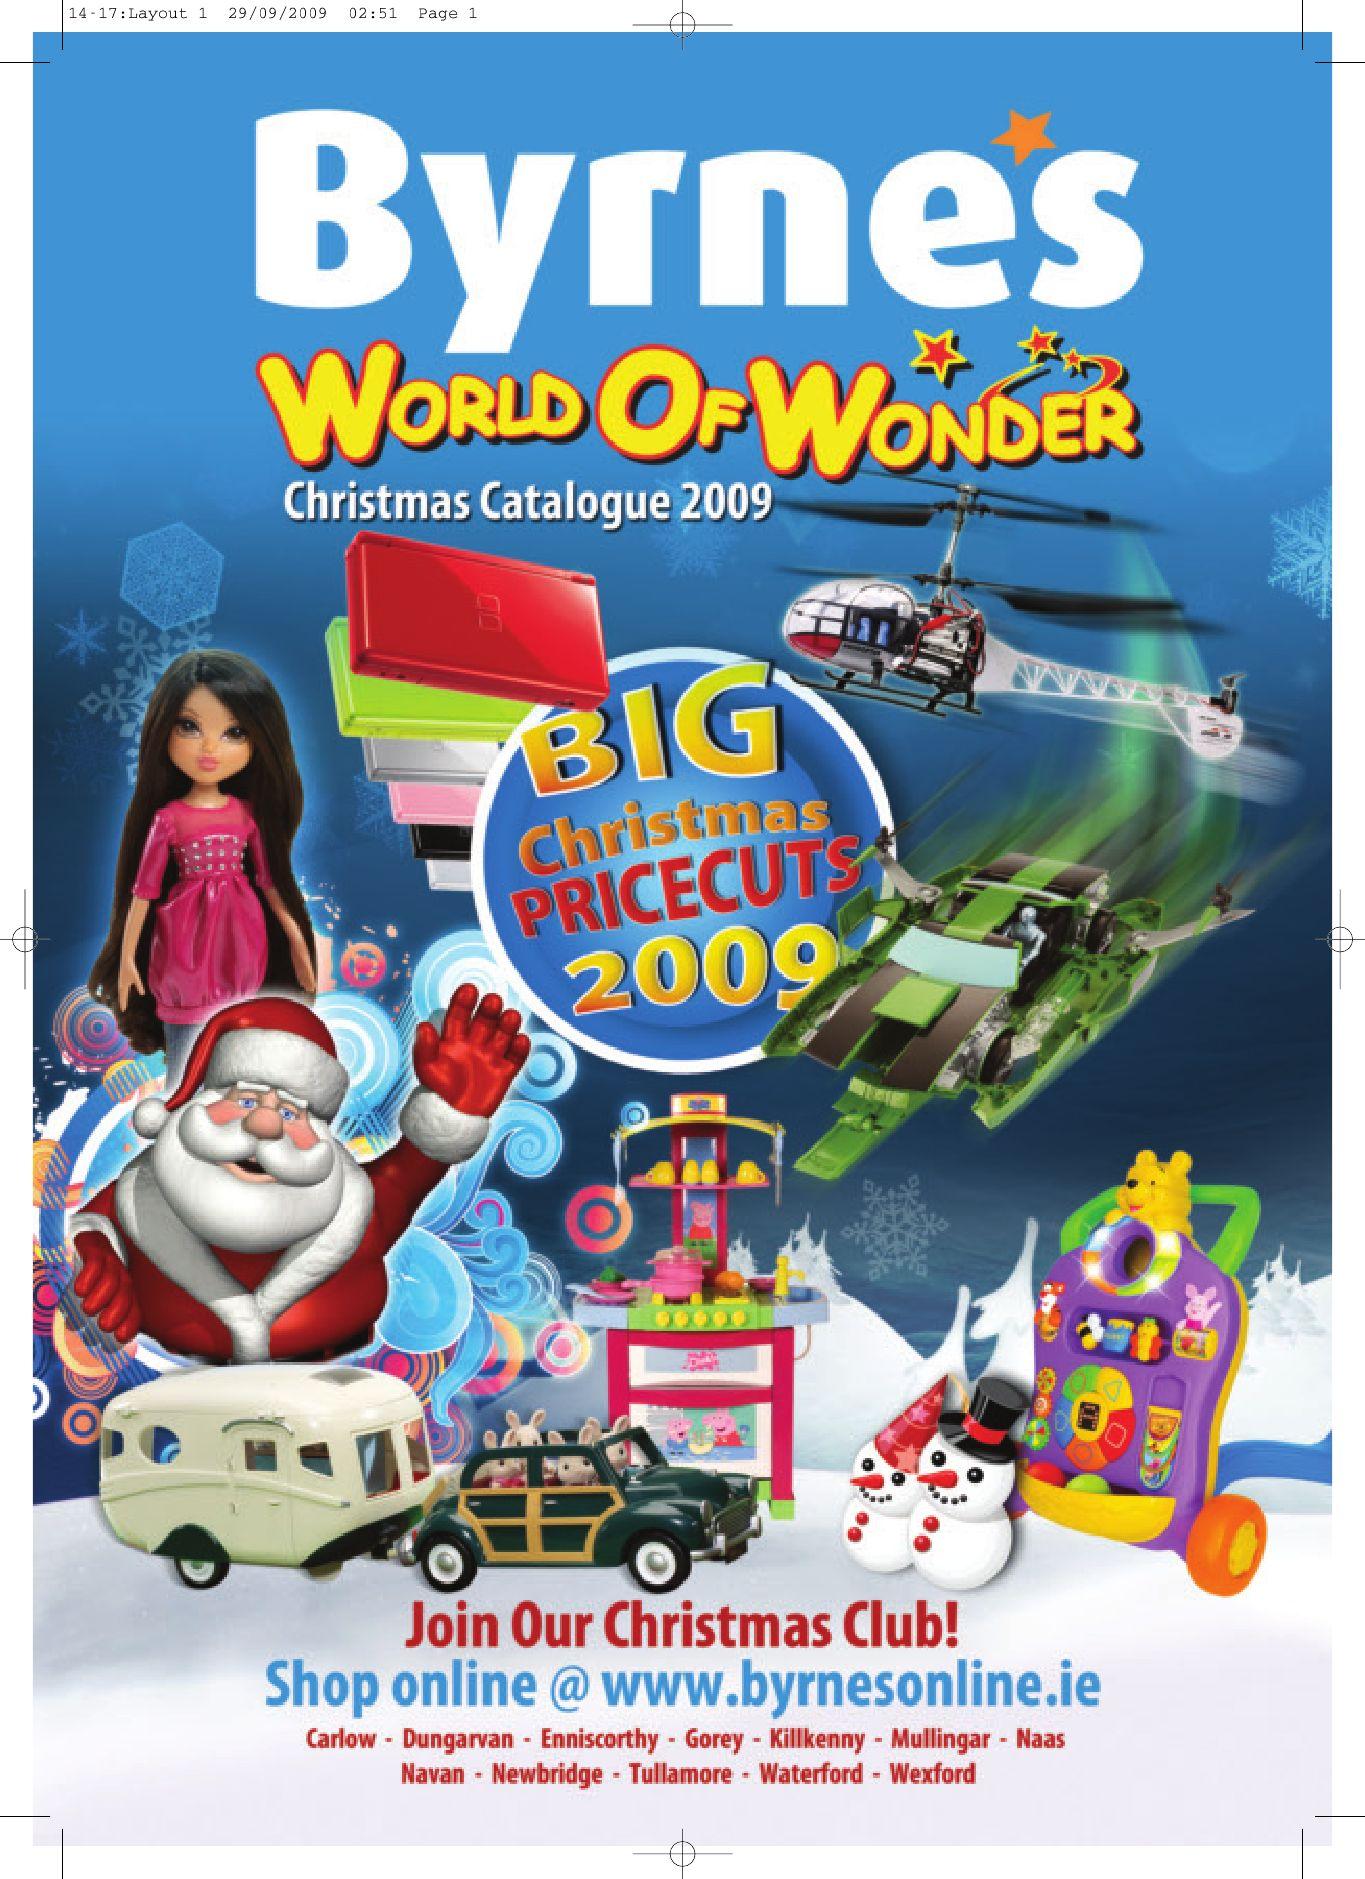 New Playground Friends The Best Dora The Explorer Mini Poster 40cm X 50cm 100% Original